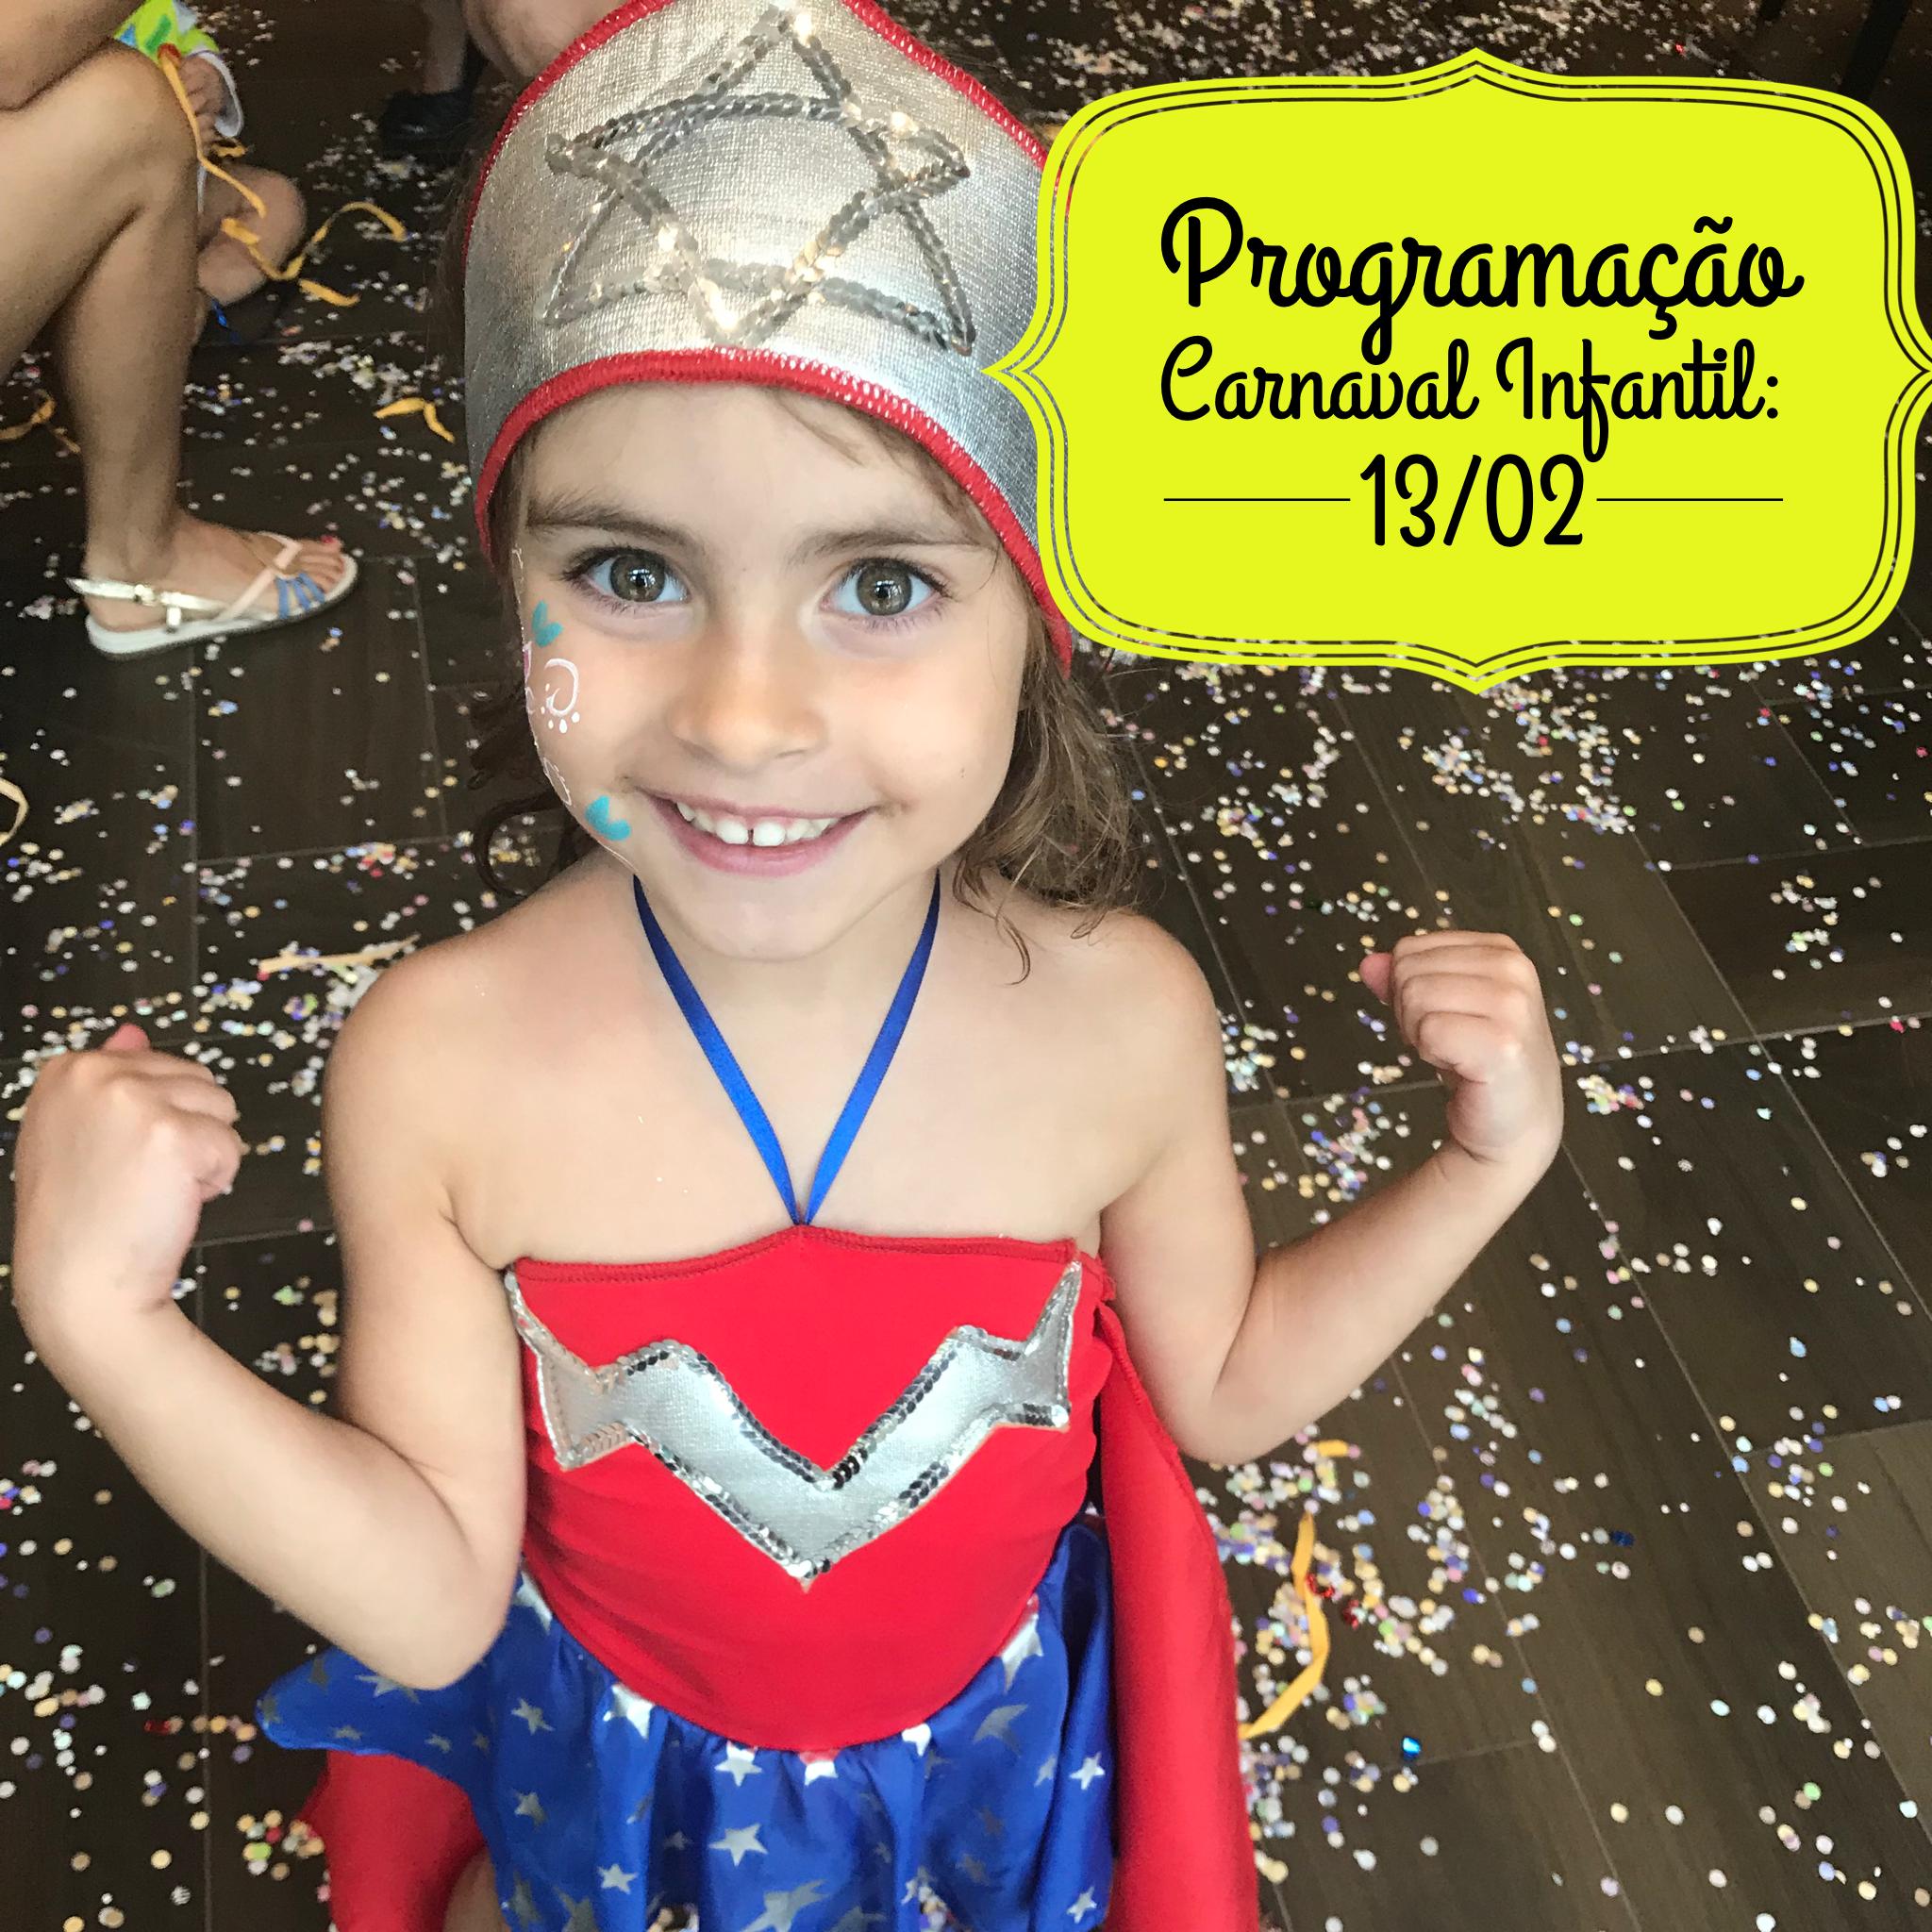 8130bfe22628 Programação do Carnaval Infantil: Terça, 13/02 - Passeios Kids